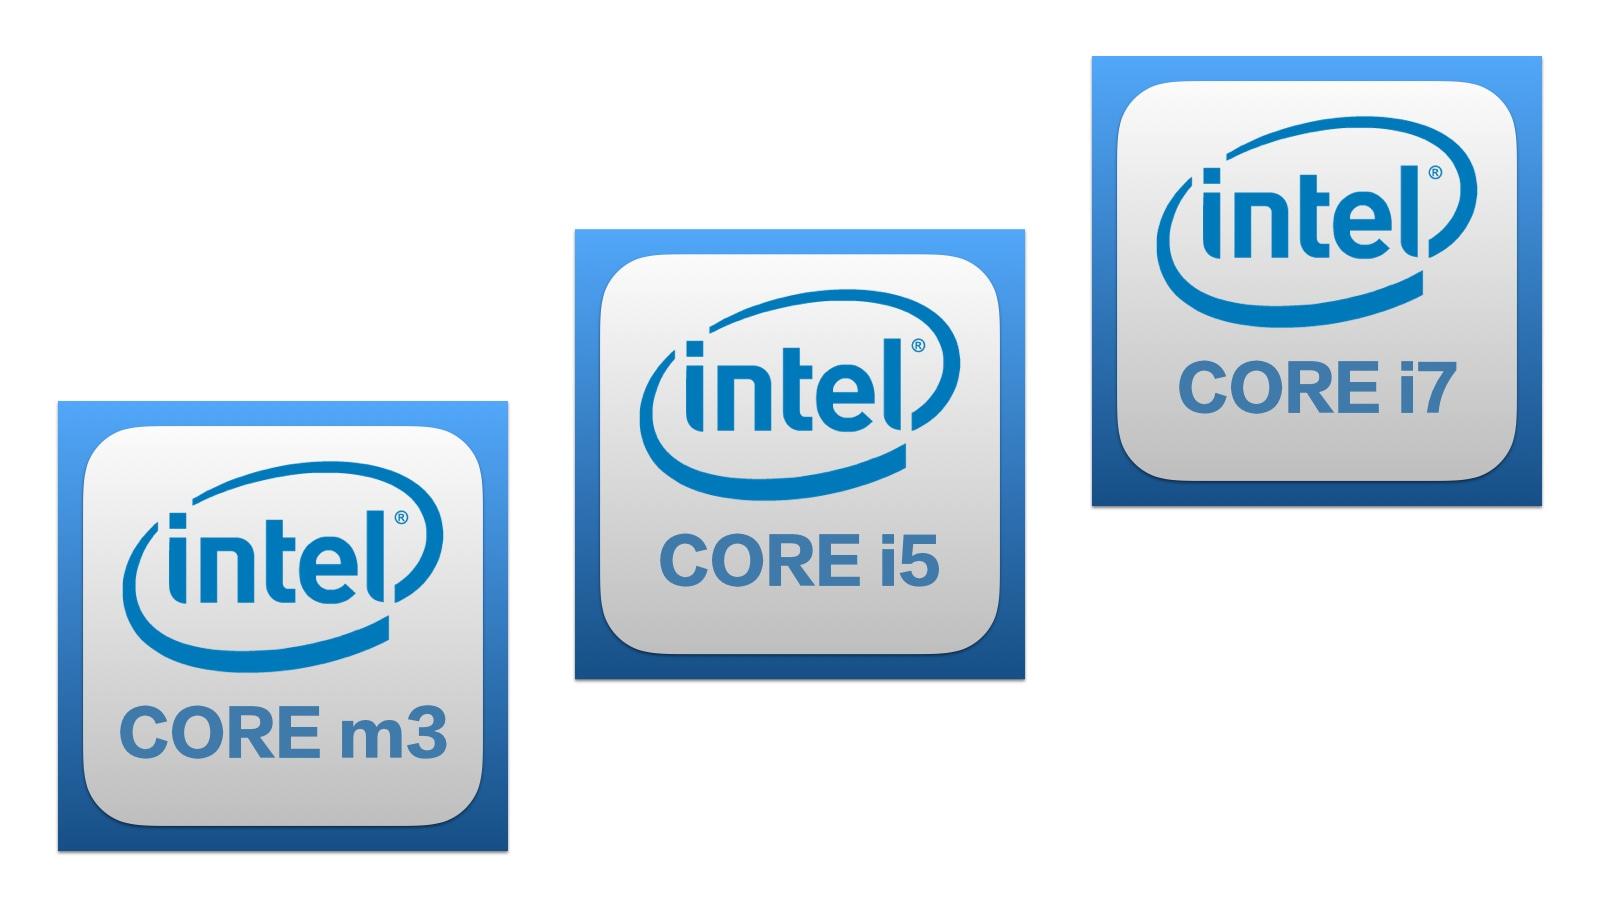 MacBook Intel Kaby Lakeプロセッサ